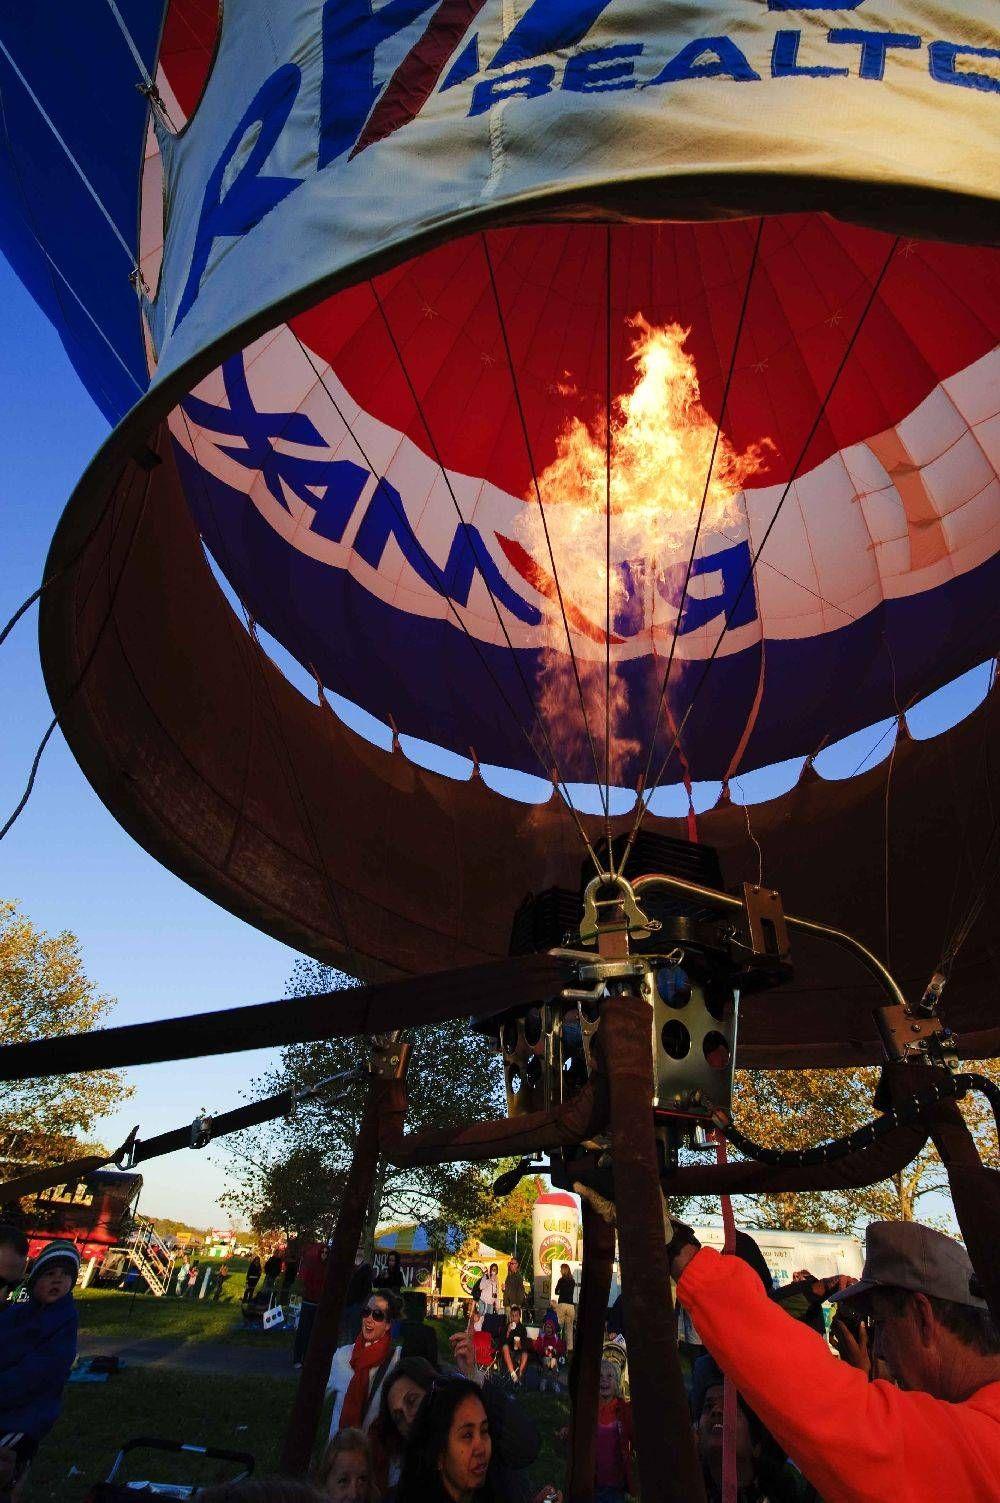 Image Detail For Shenandoah Valley Hot Air Balloon Wine Music Festival Hot Air Balloon Hot Air Air Balloon